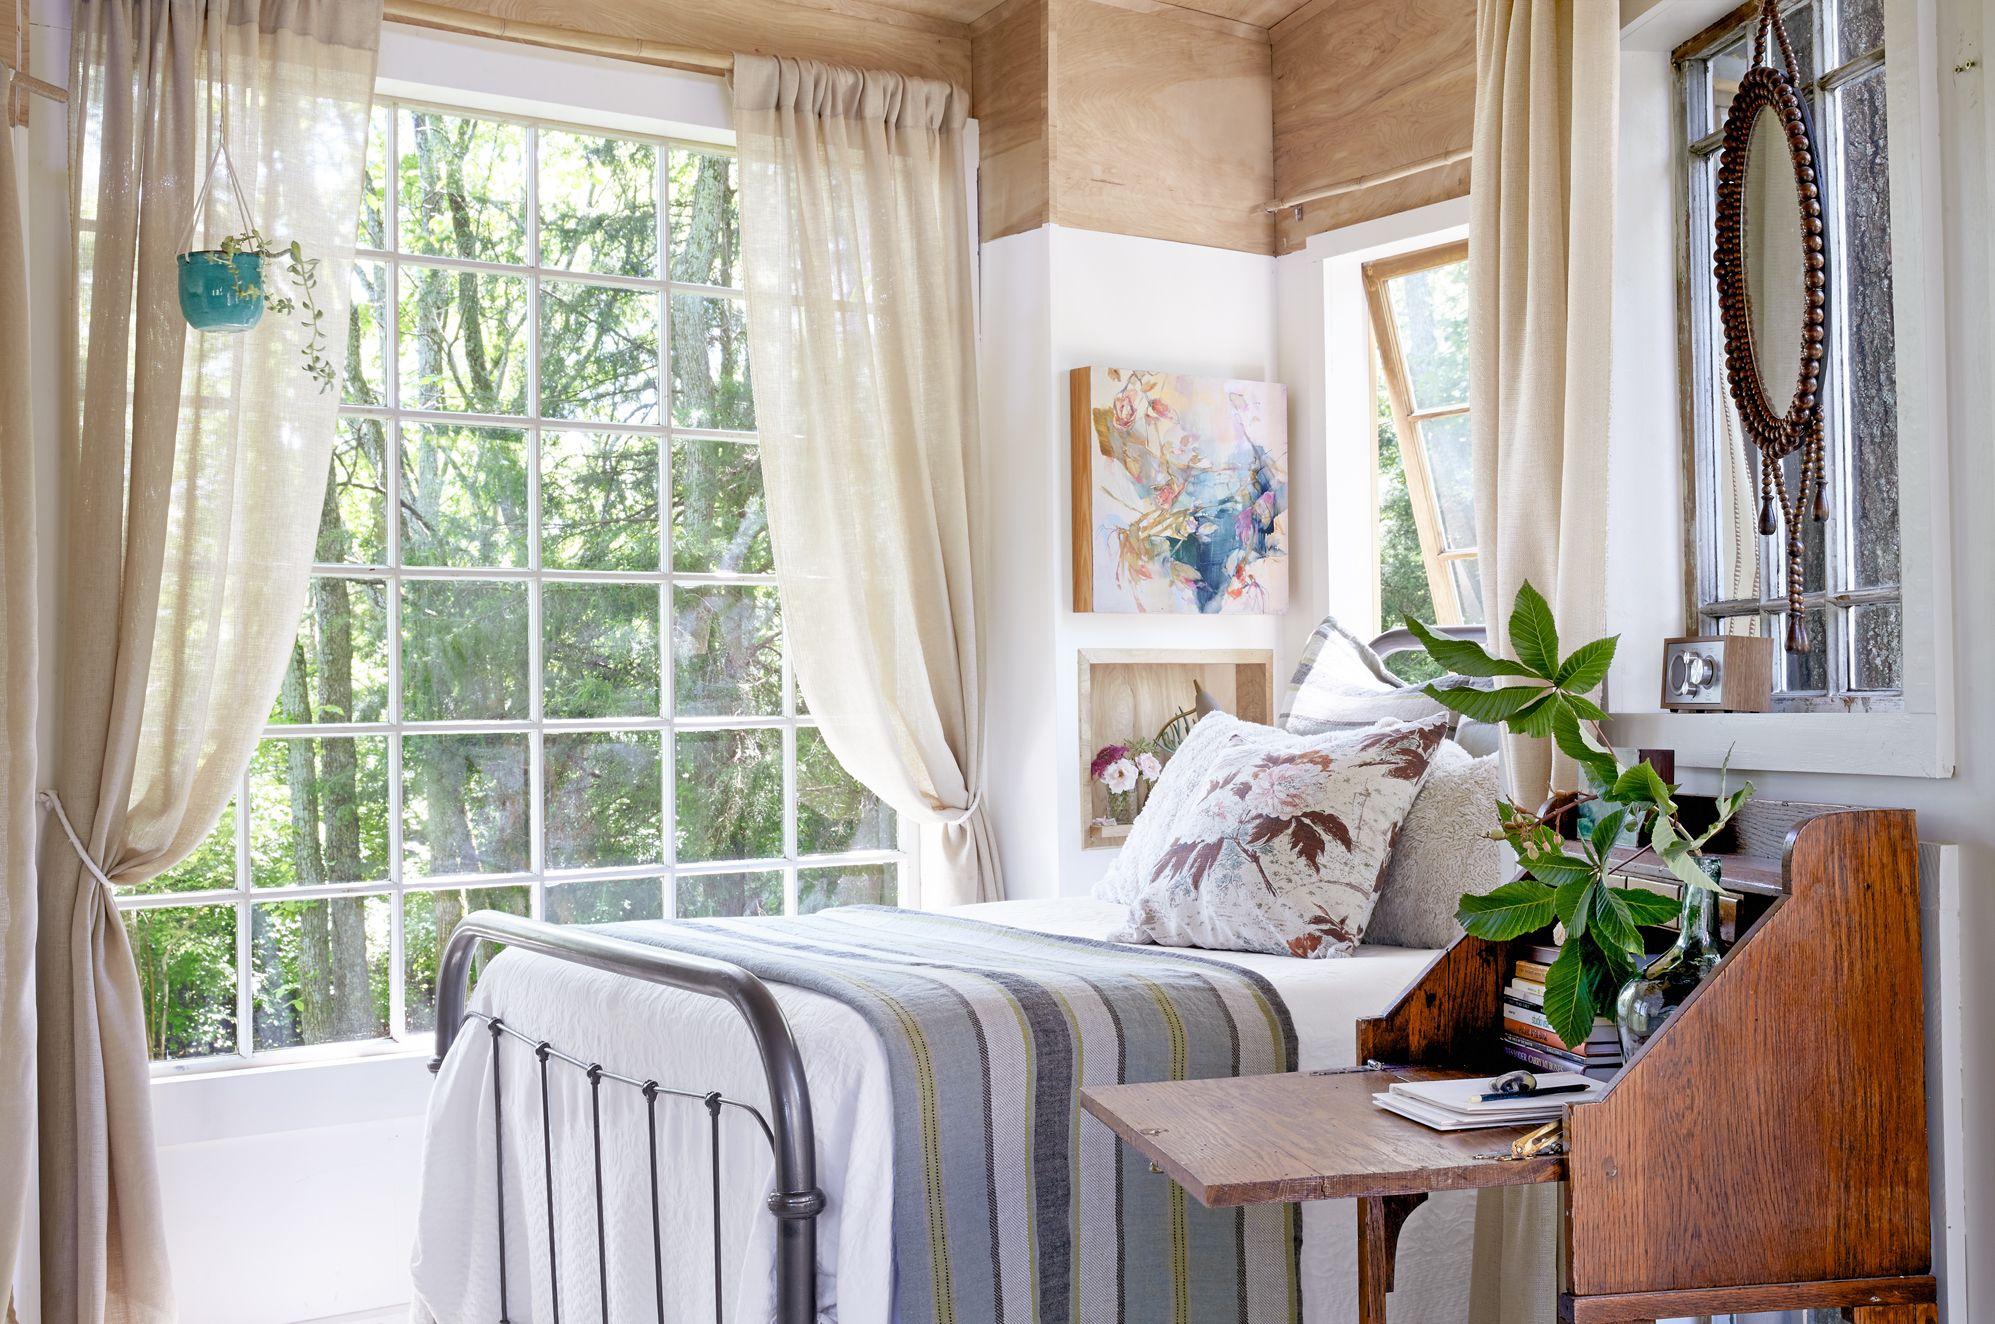 42 Cozy Bedroom Ideas - How To Make Your Room Feel Cozy on Cozy Teenage Room Decor  id=57577